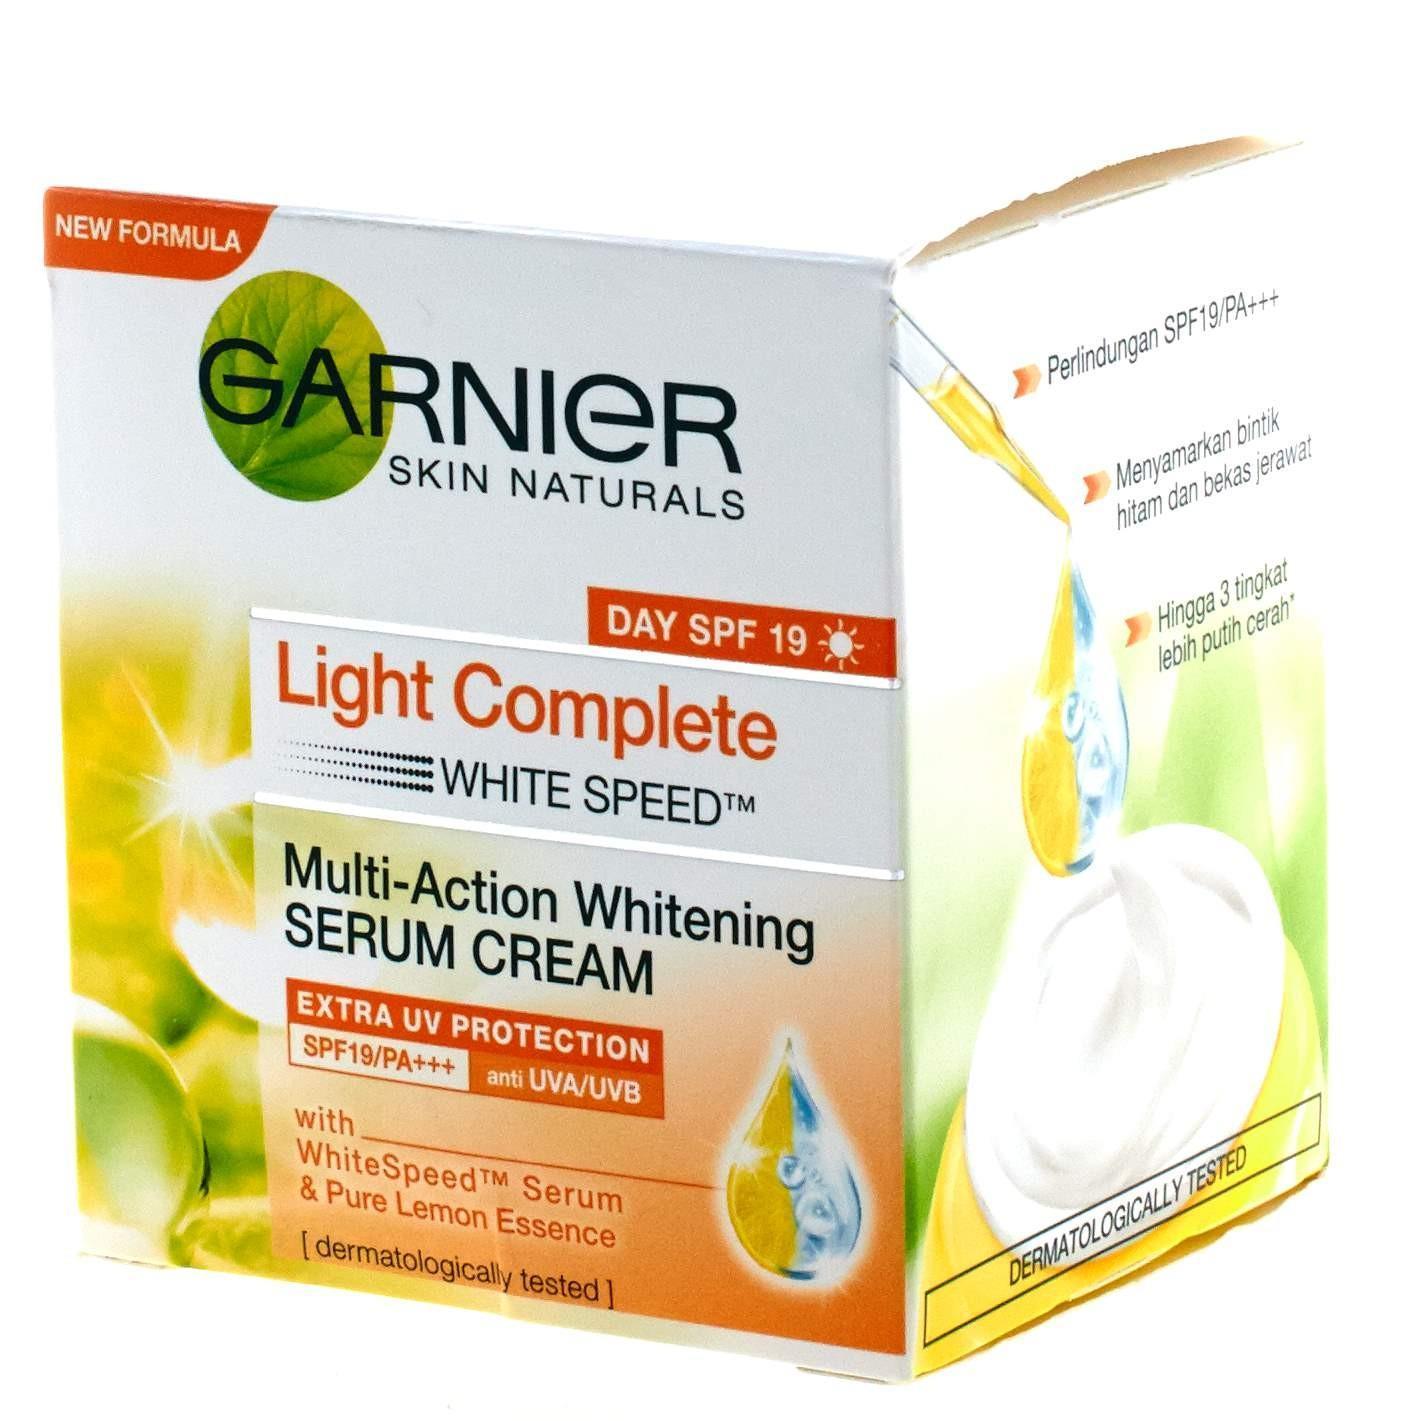 Lihat Garnier Light Complete Speed Serum Cream 50ml Dan Harga White Super Foam 10 100ml 3